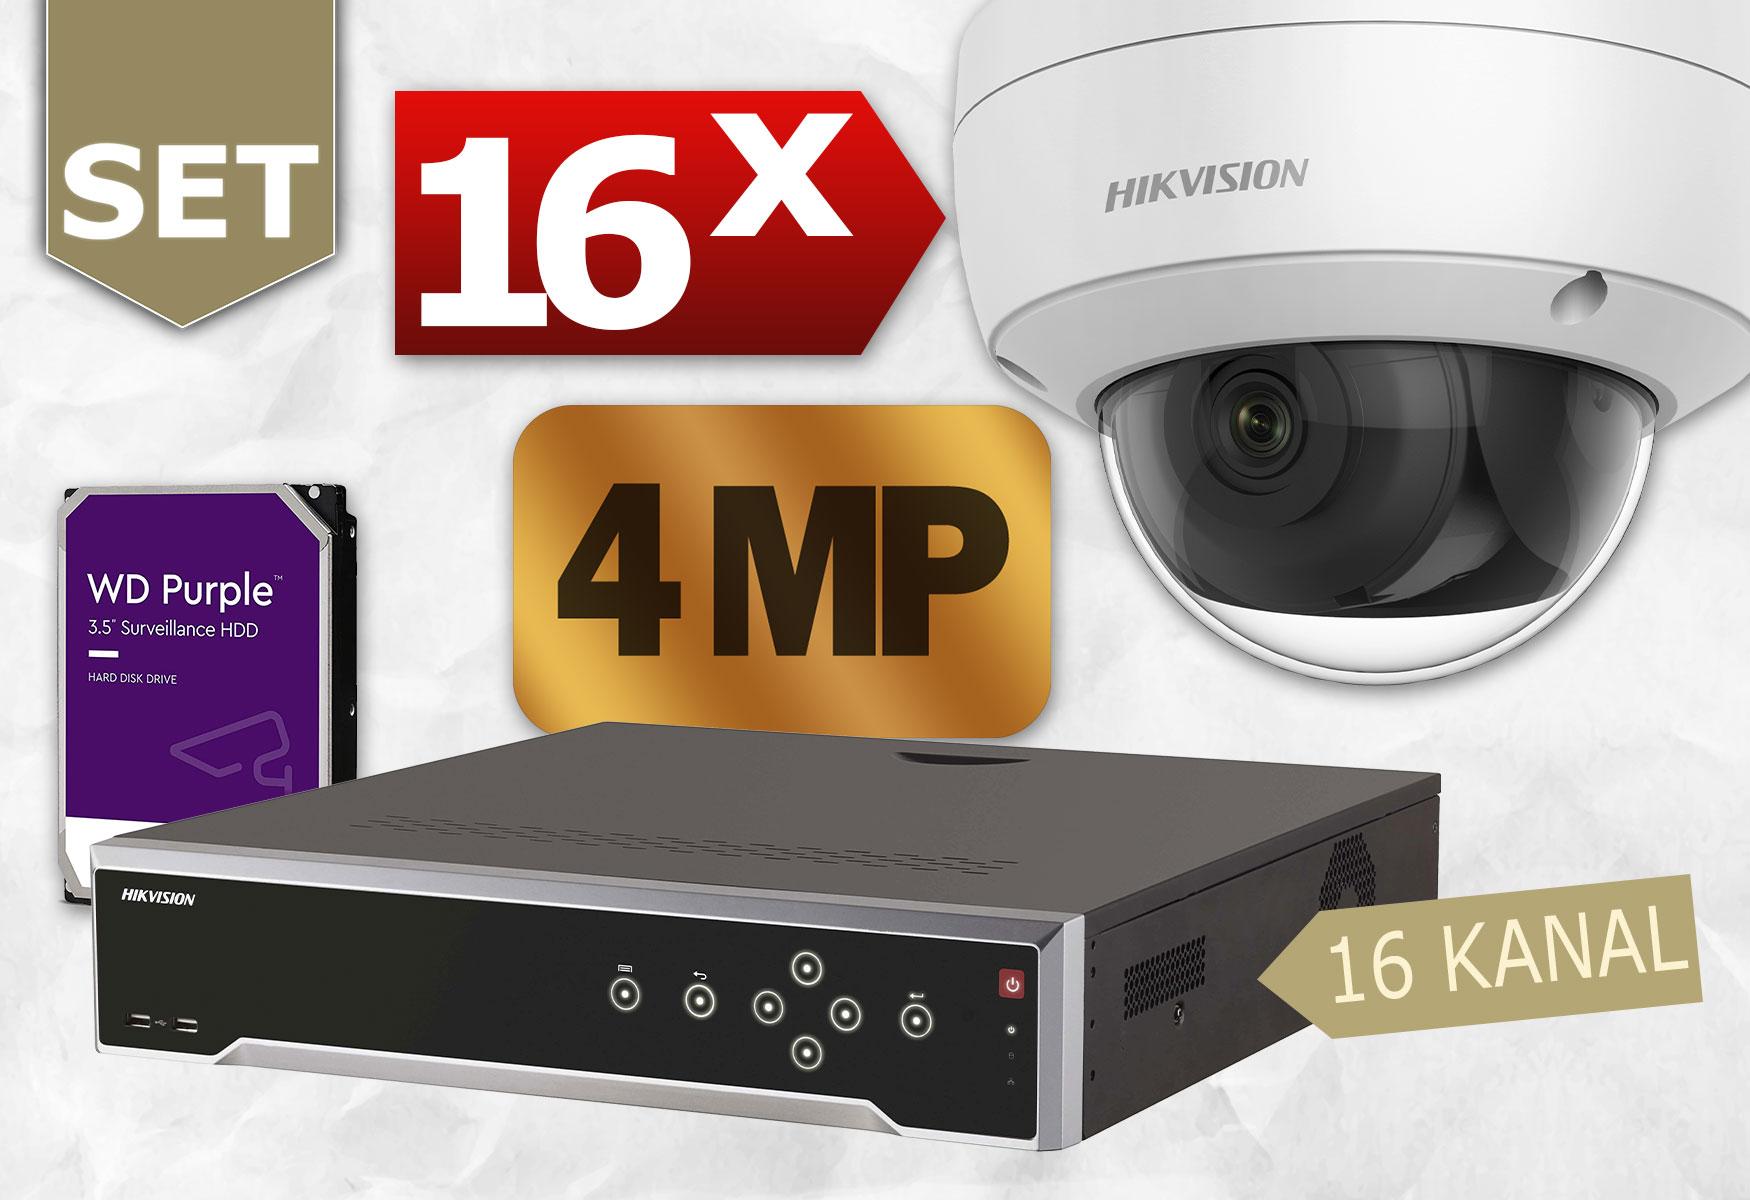 Dome-16x-4MP-16-Kanal-Netzwerkgeraet-ueberwachungskamera_set_nvr_ip_kamera-GekkoStuff_2.jpg